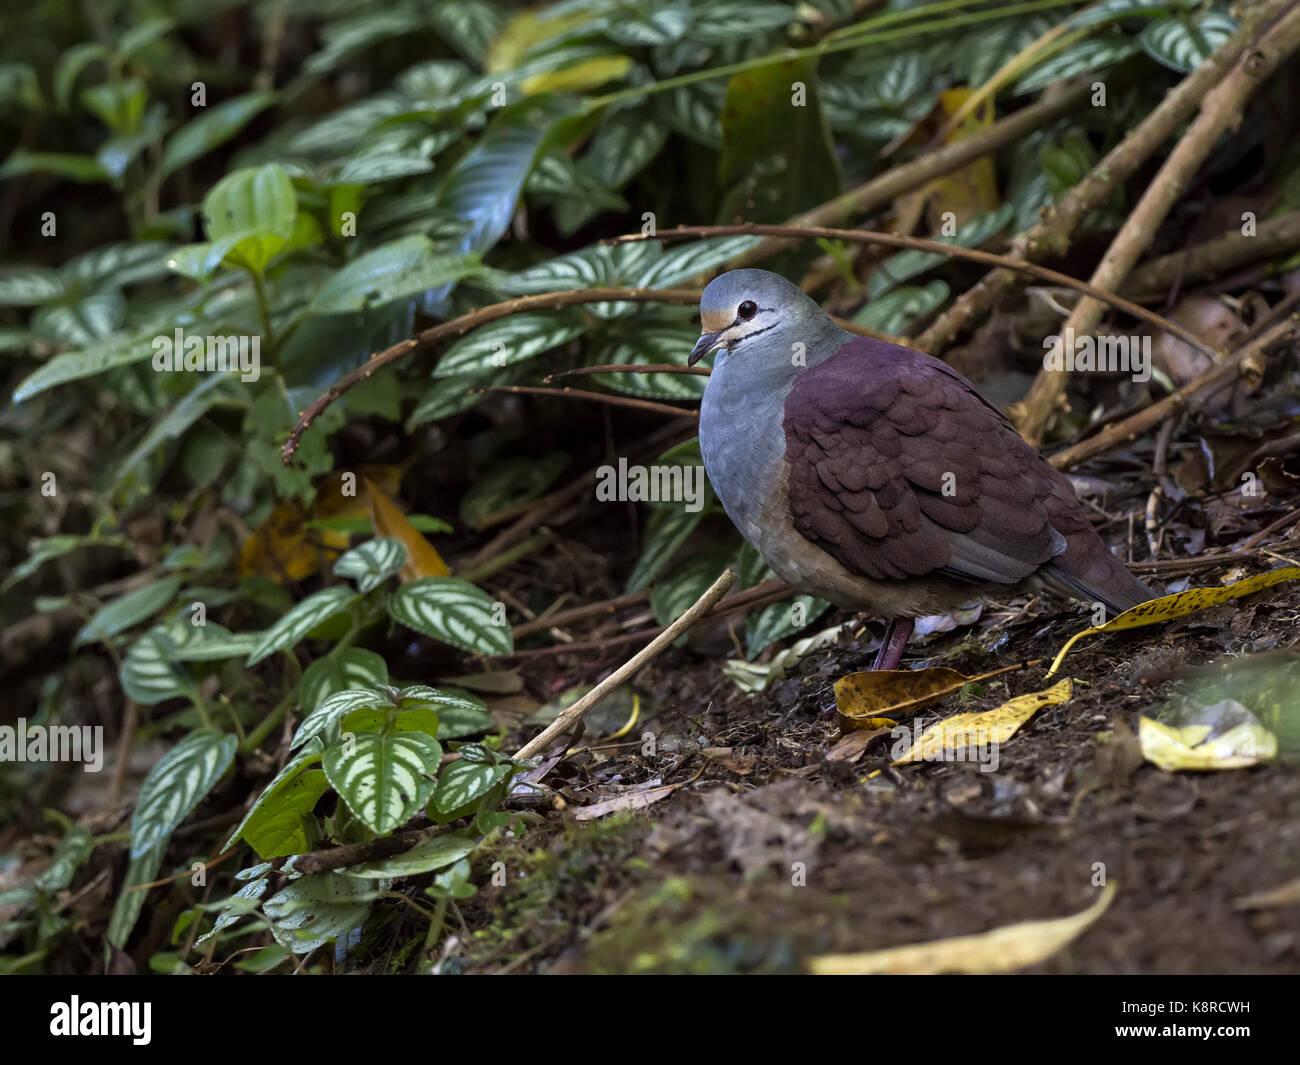 Buff-fronted Wachtel - Dove (Centrygon costaricensis), Chiriqu', Panama, Februar Stockbild